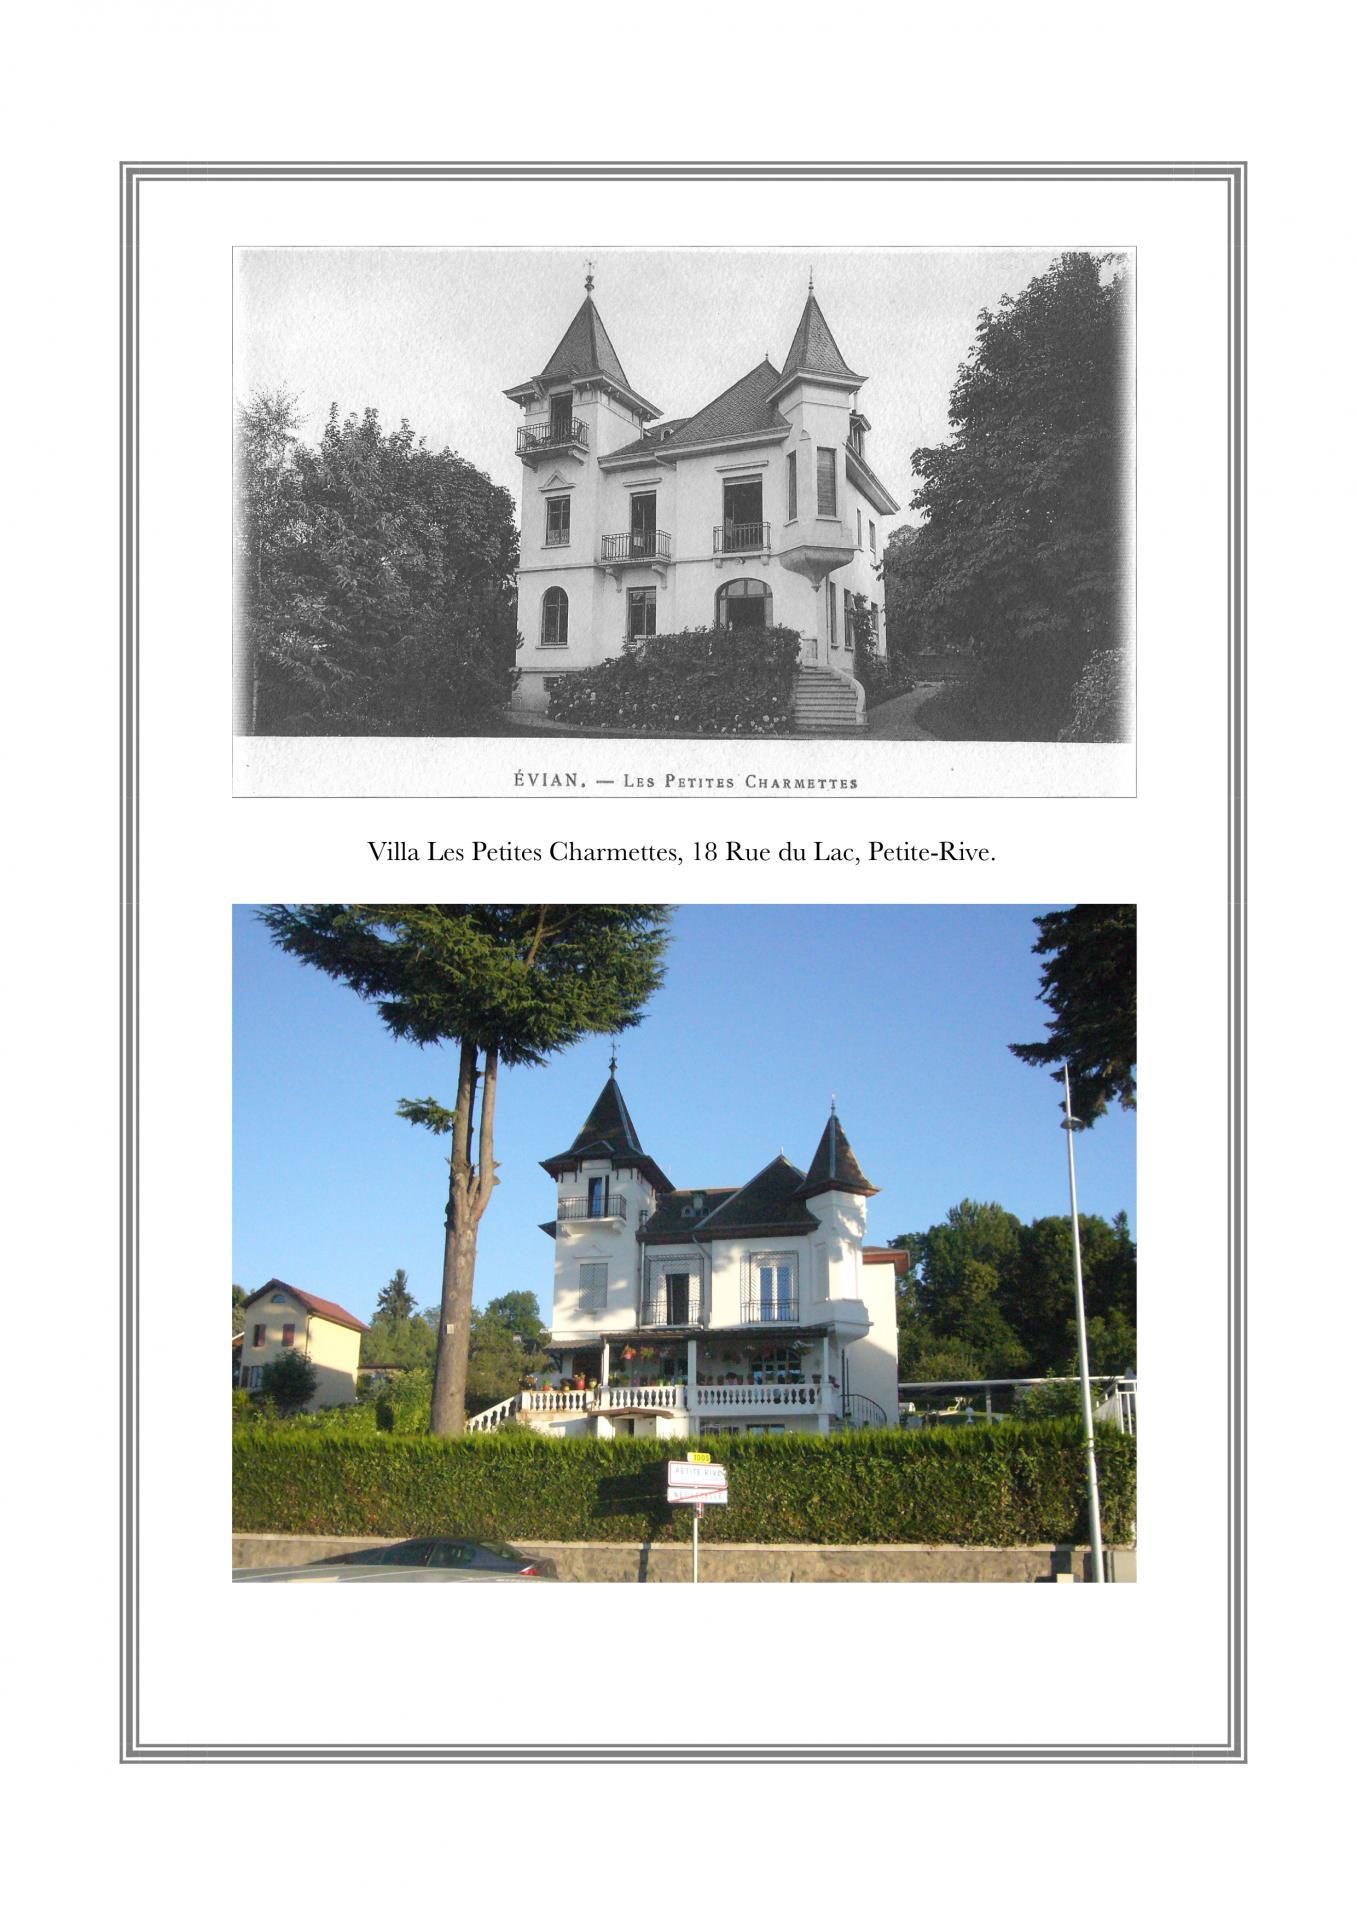 Villa Les petites Charmettes, 18 rue du Lac, Petite-Rive